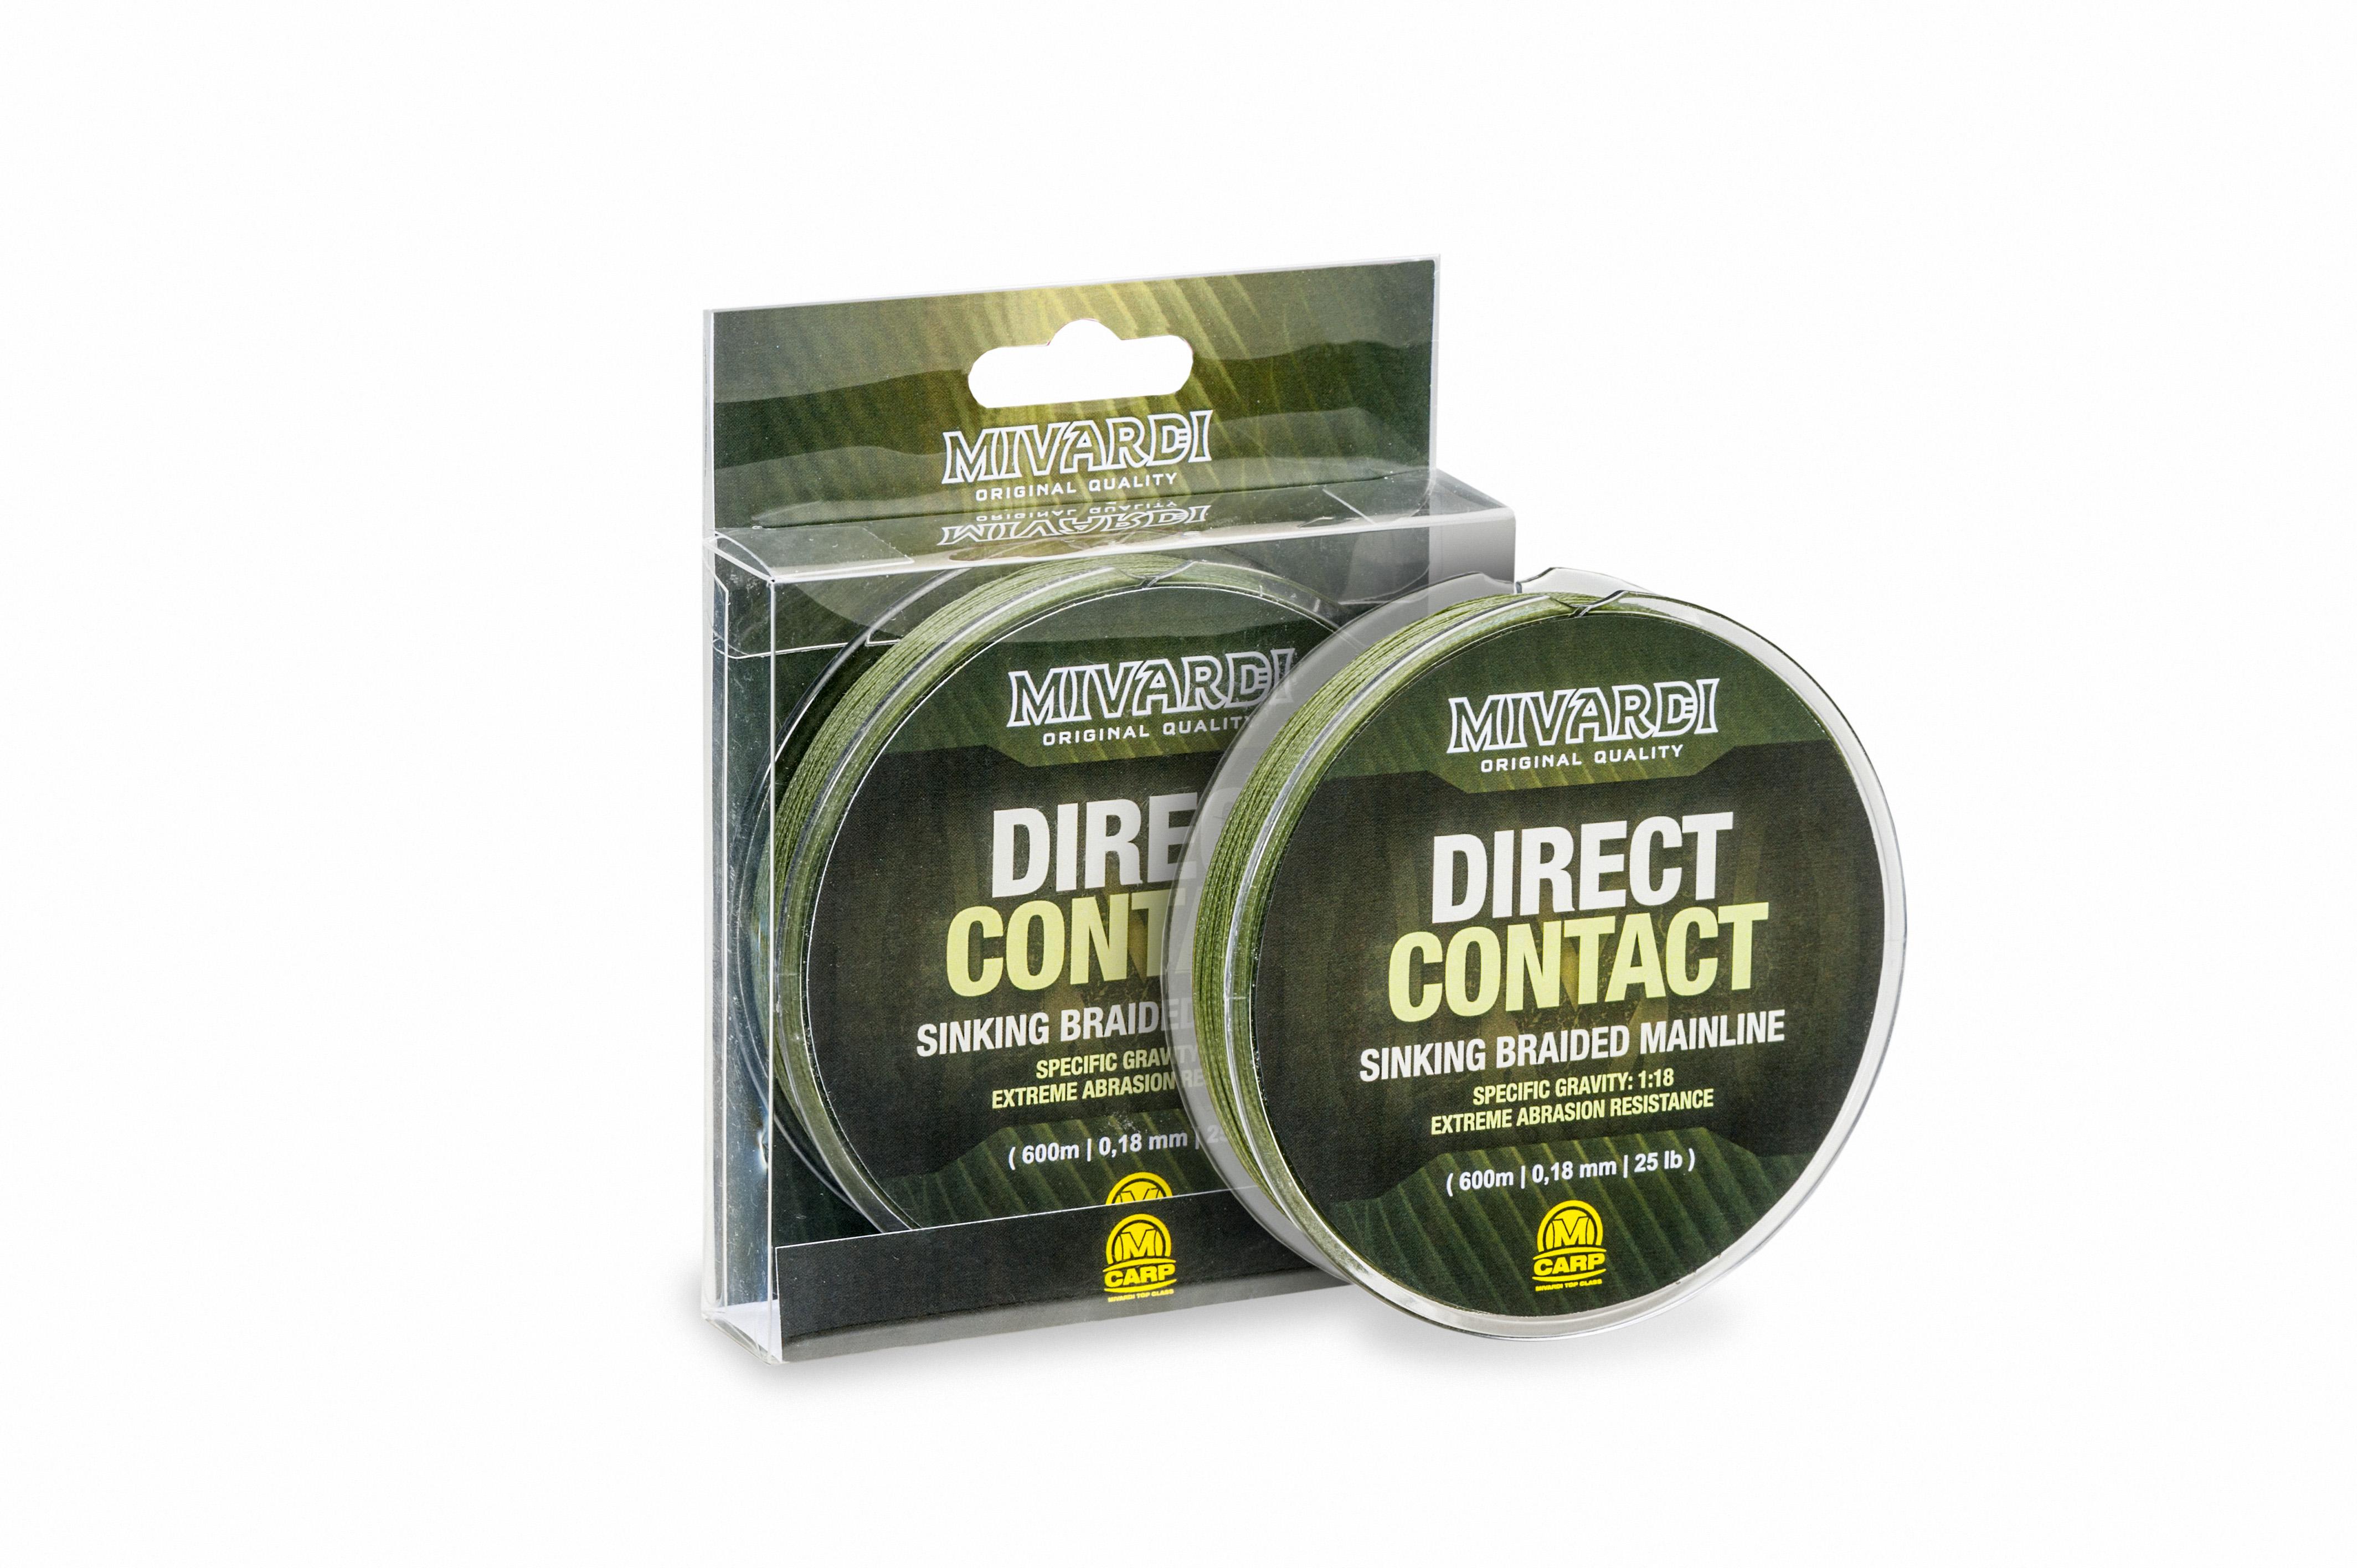 DirectContact Sinking braid 0,18mm    1200m   (25lb)